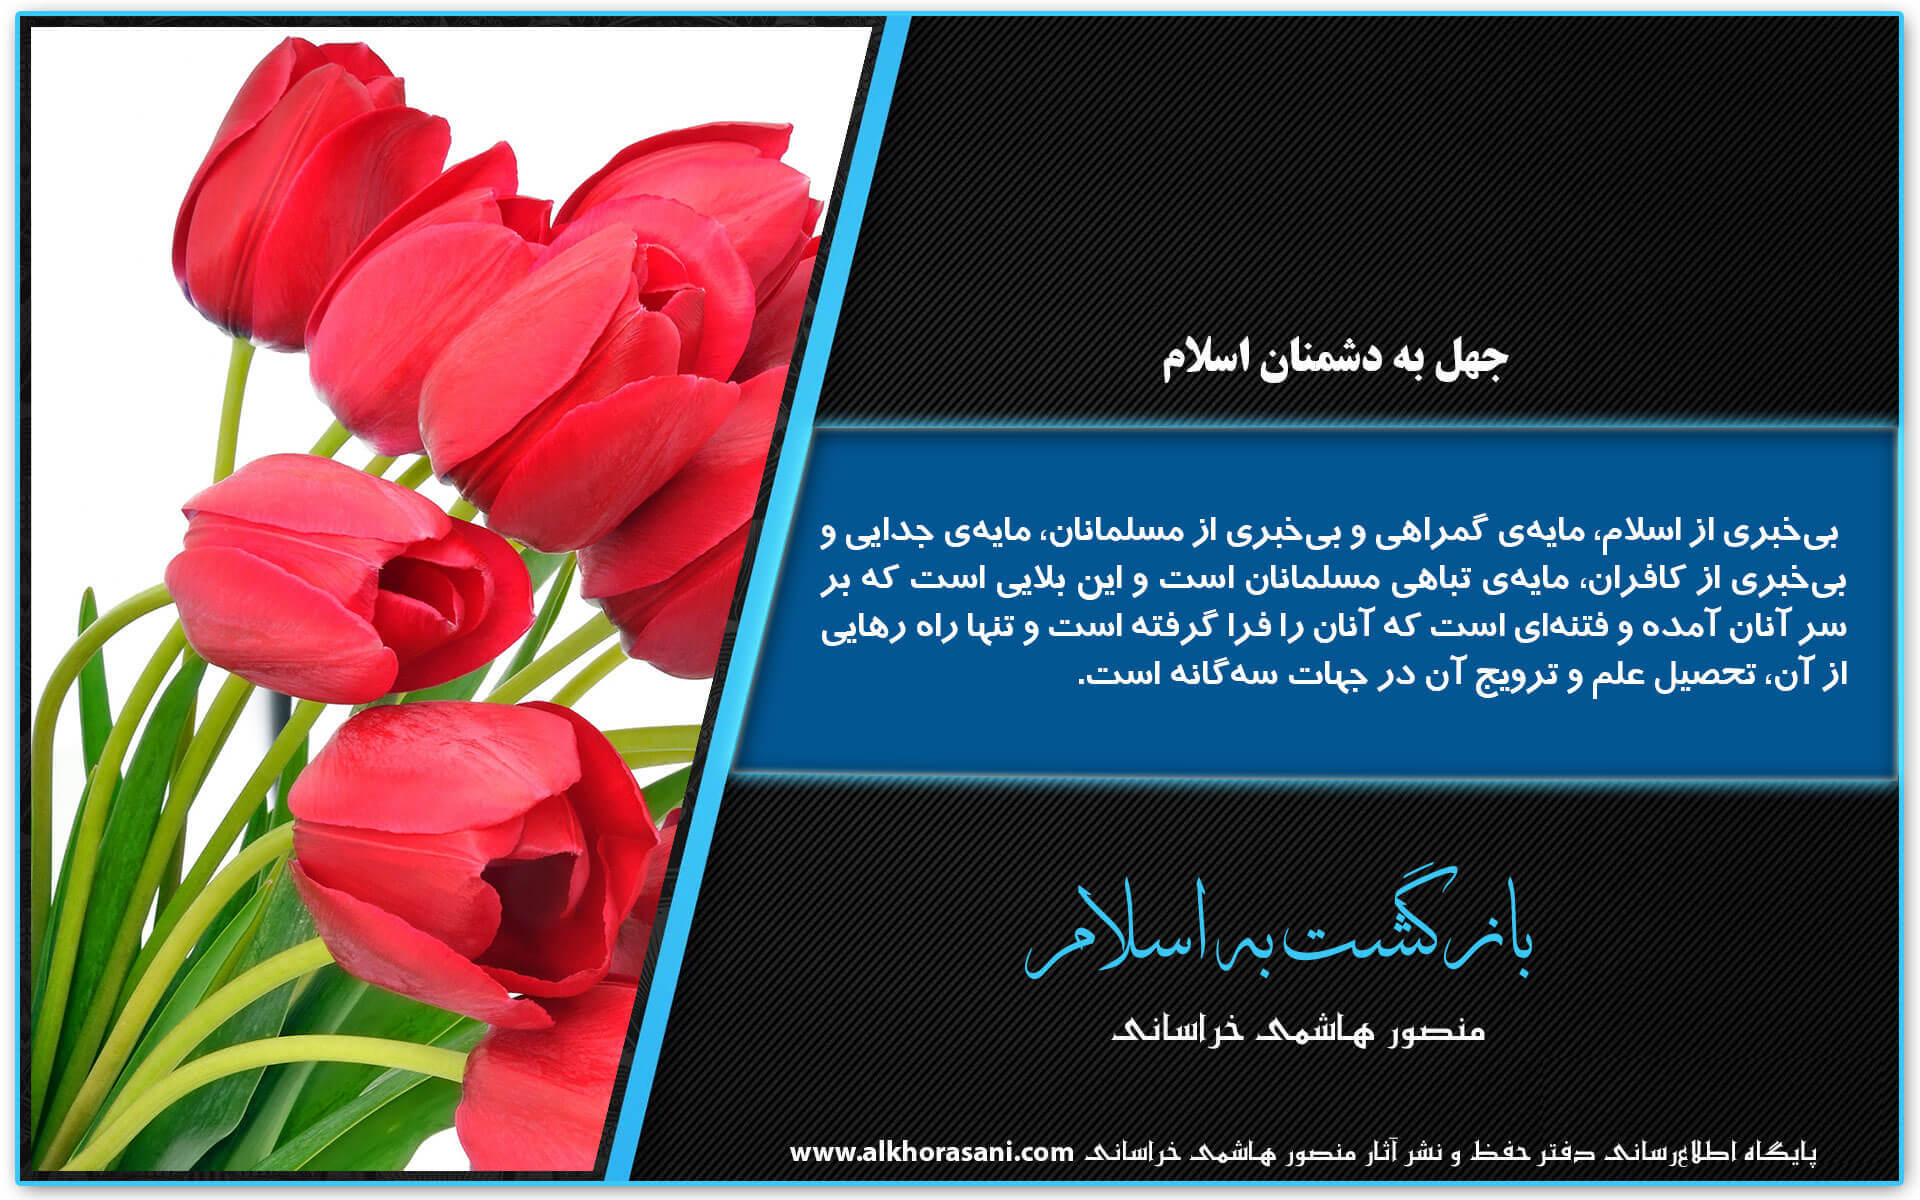 جهل به دشمنان اسلام (3)